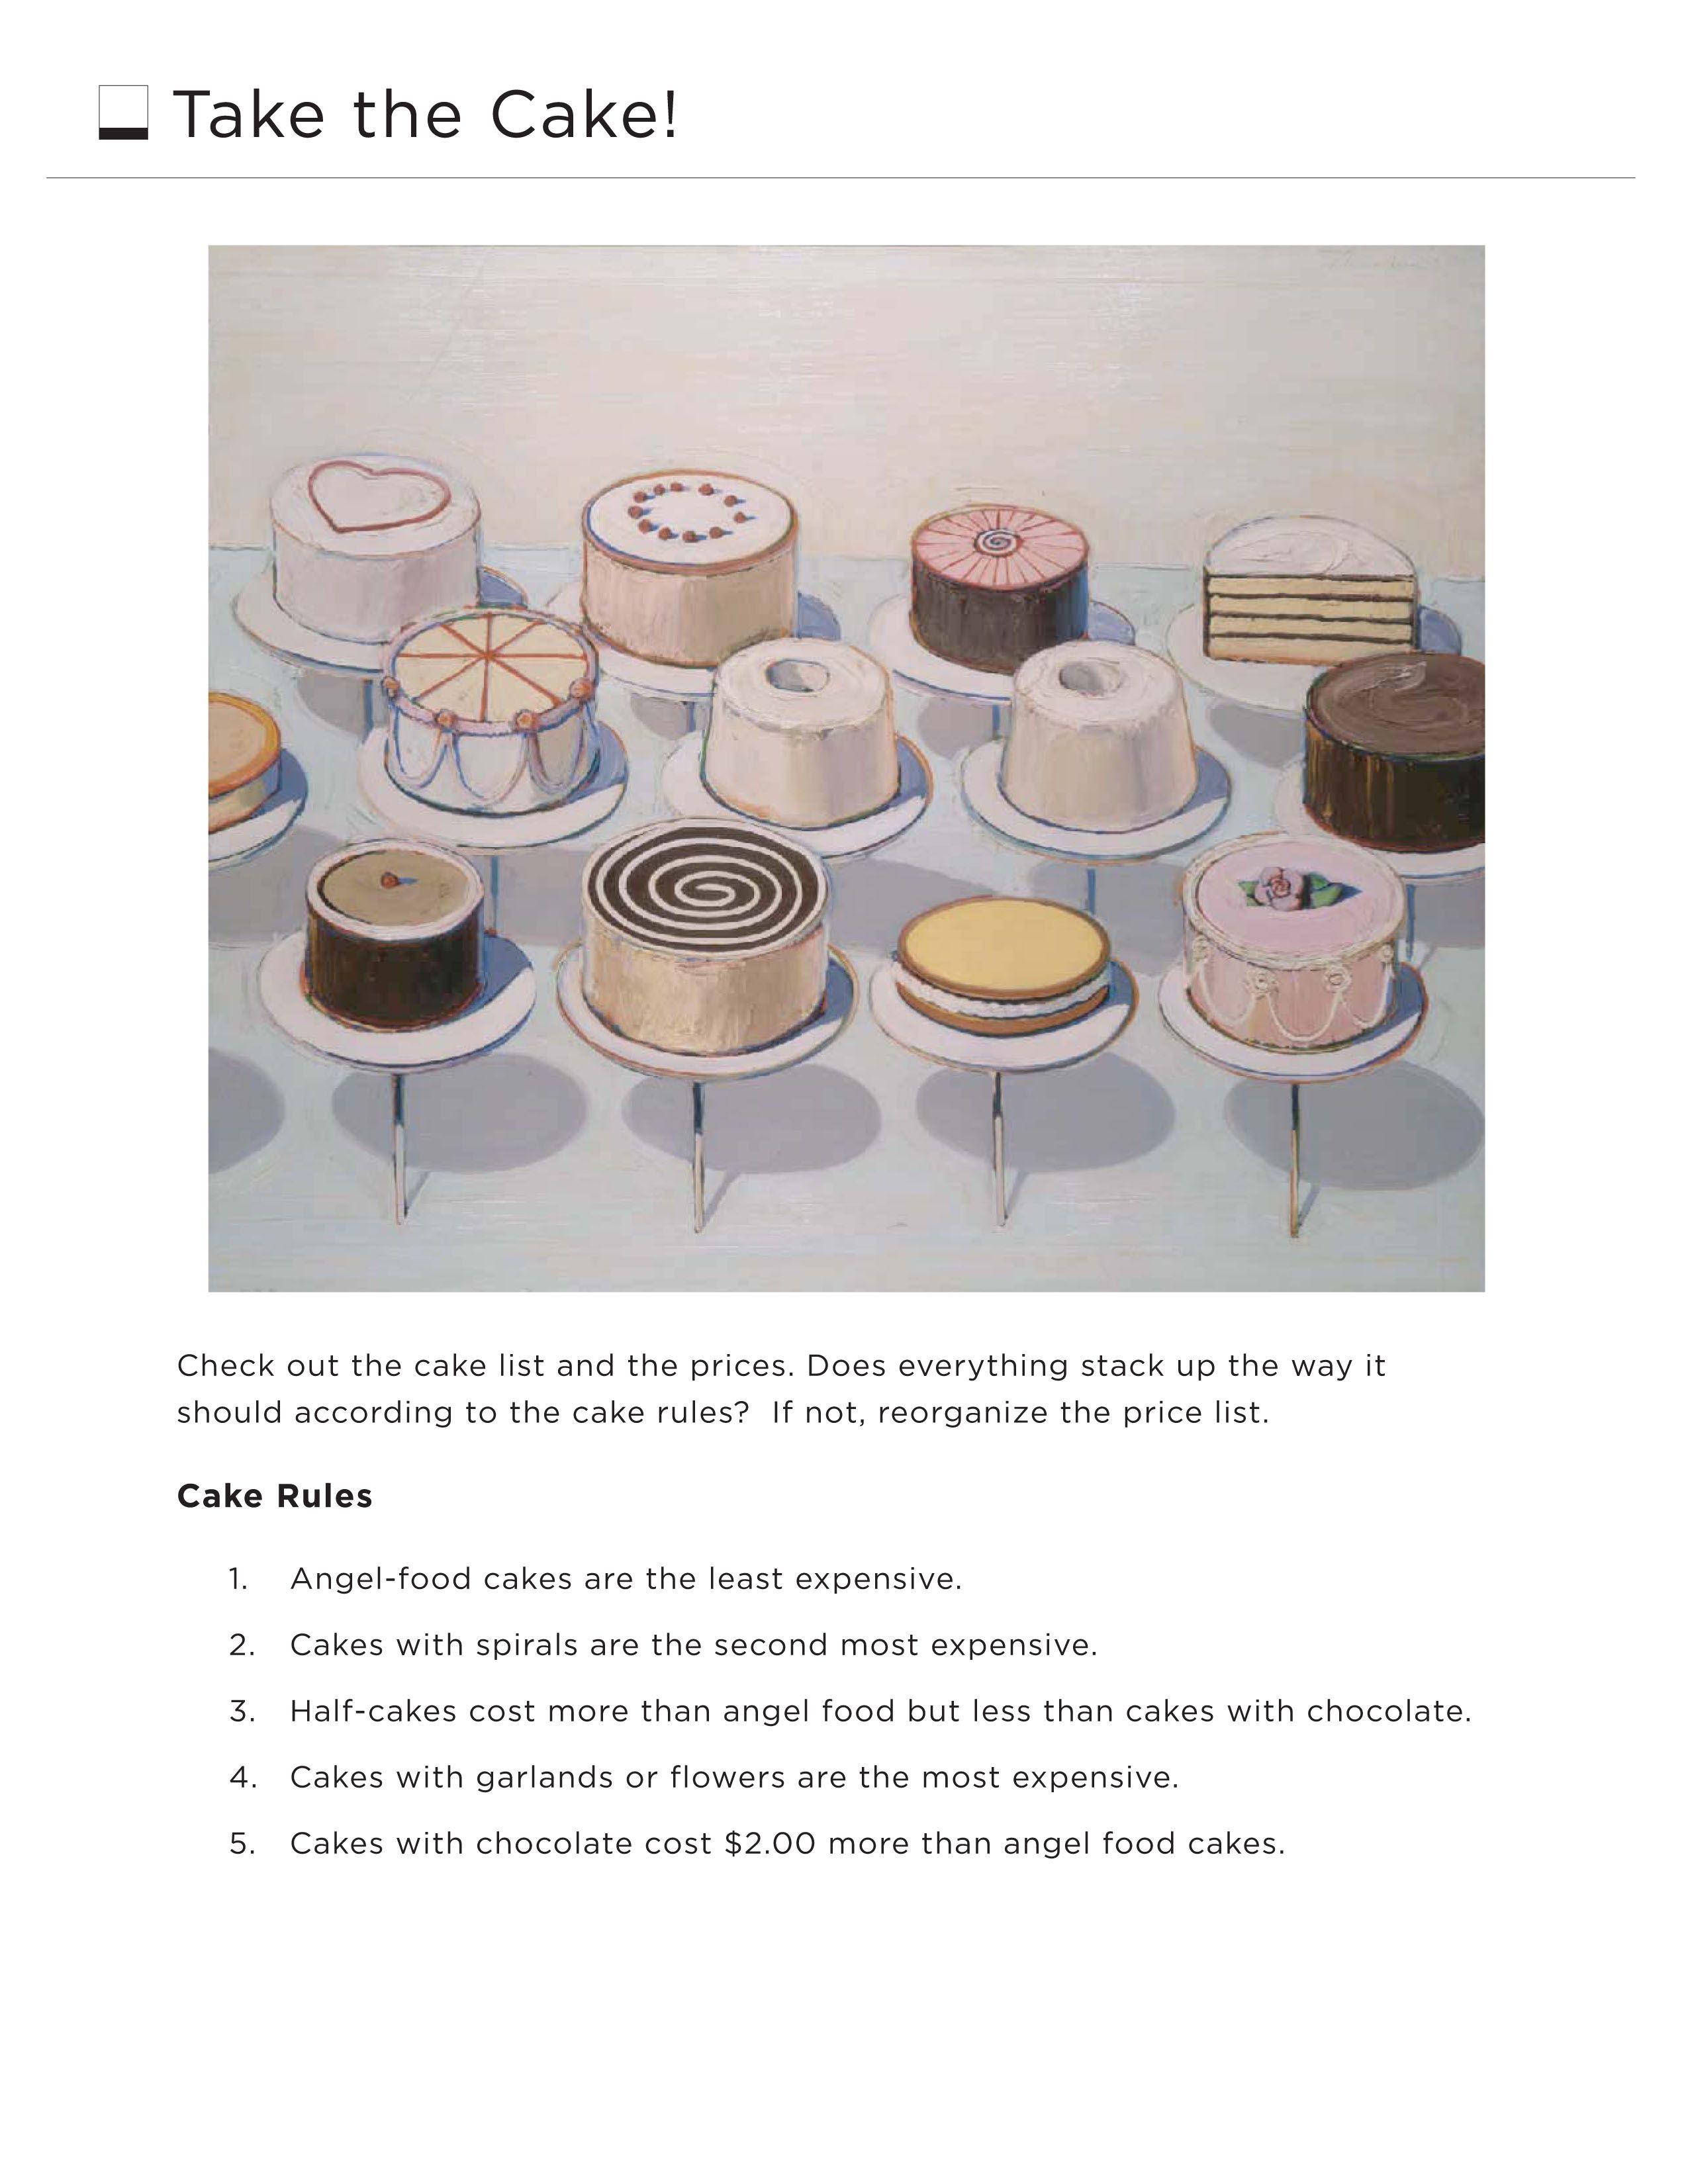 Take The Cake Worksheet Students Solve Logic And Money